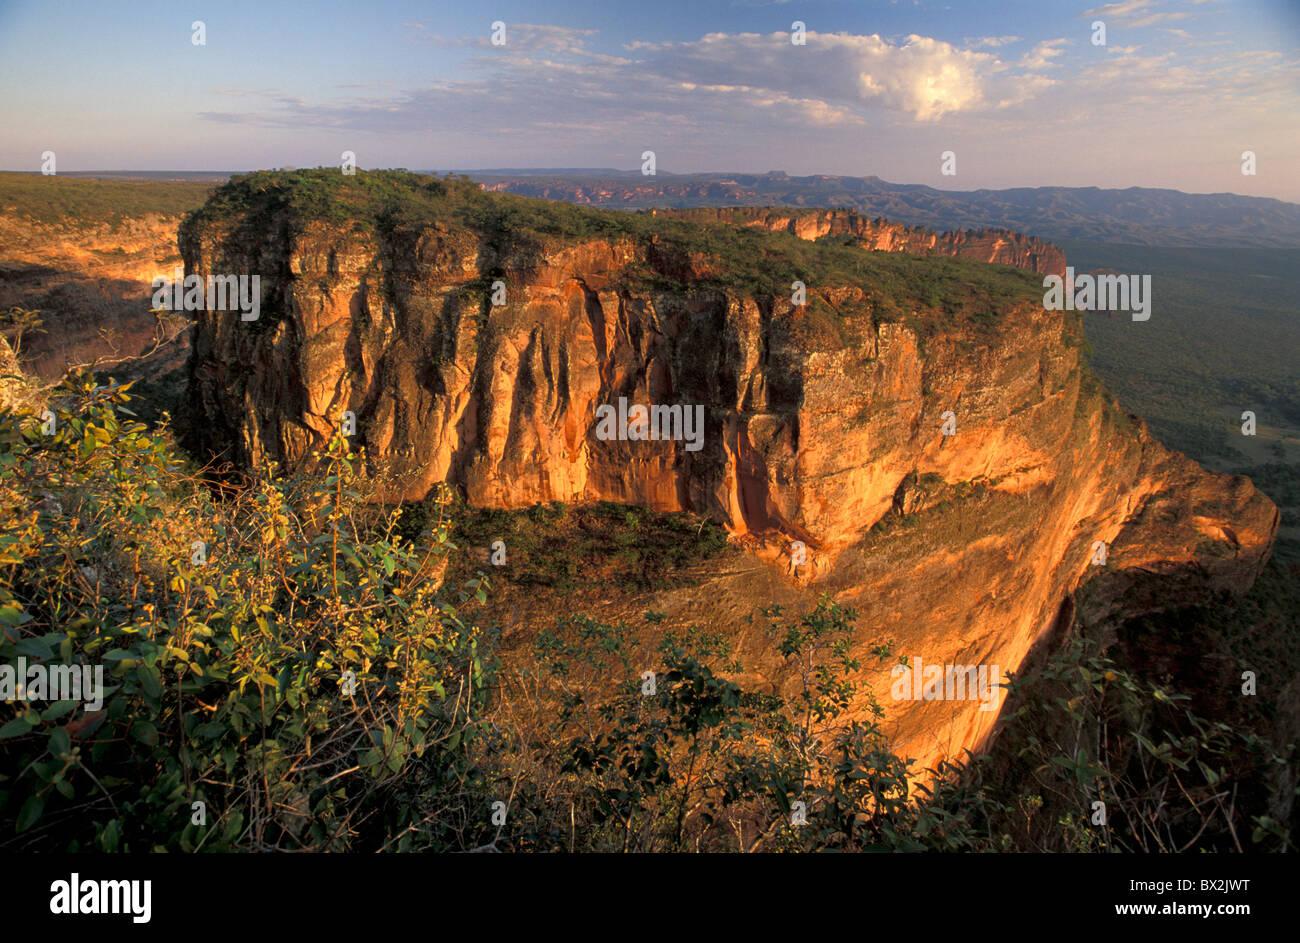 Cidade de Pedra Chapada dos Guimares near Cuiaba Mato Grosso Brazil South America landscape - Stock Image